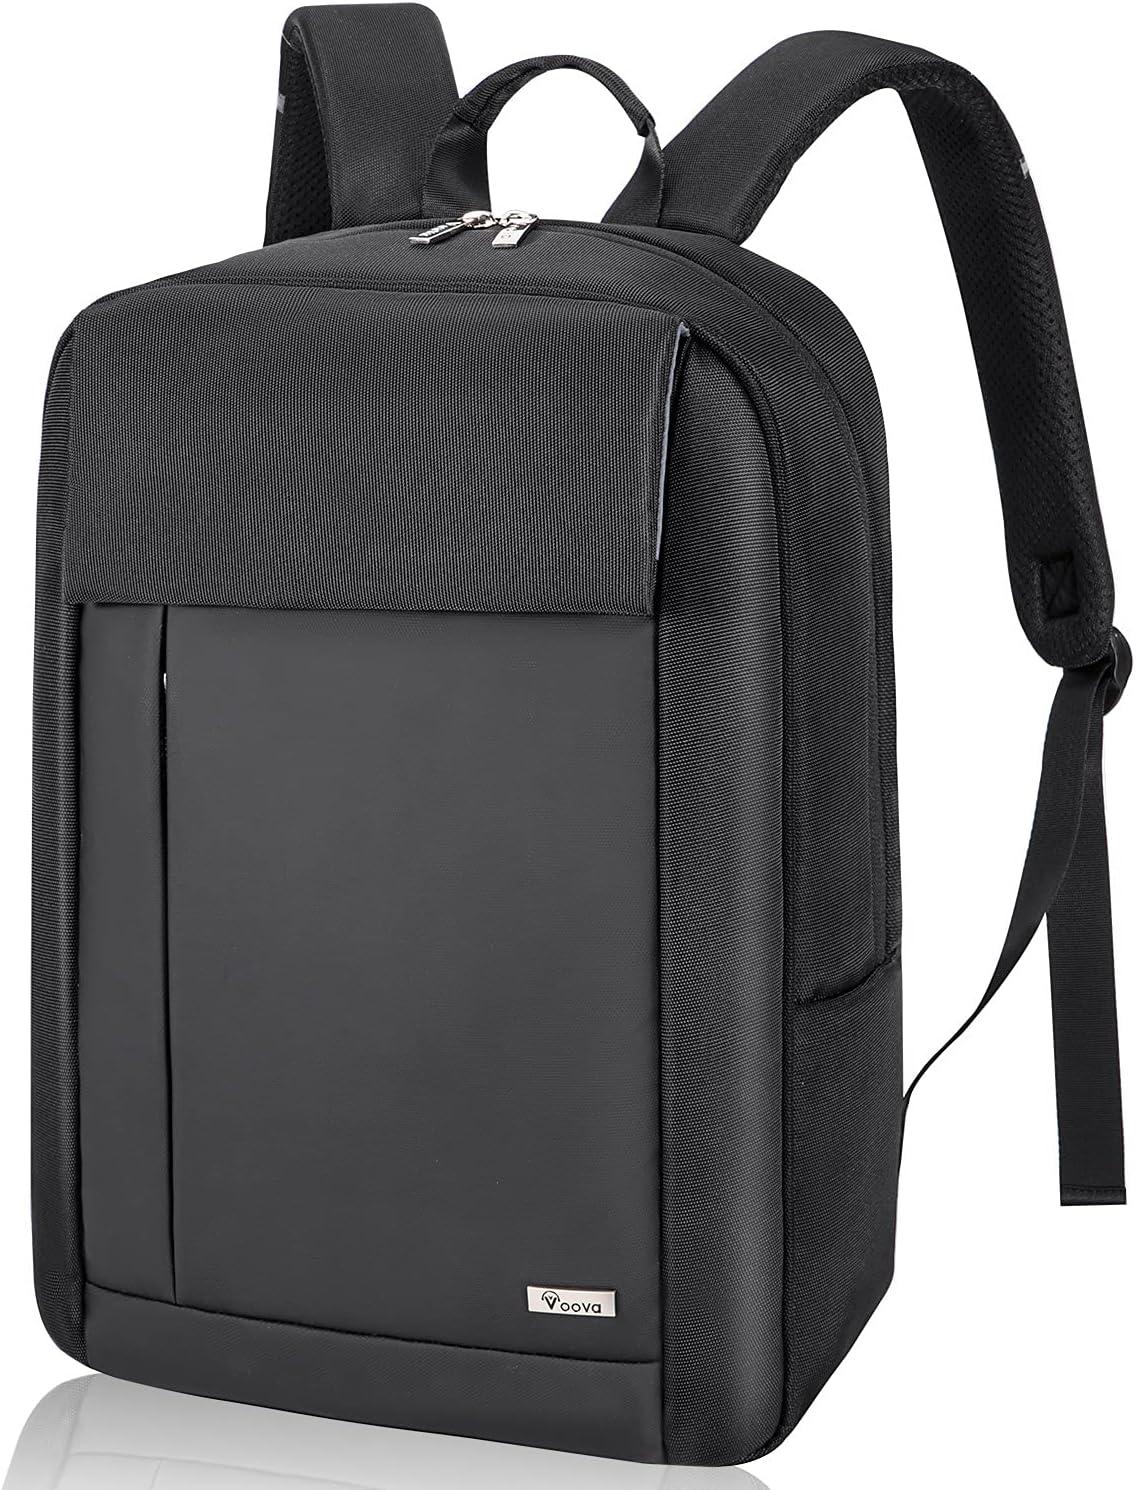 Voova Travel Laptop Backpack for Men Women, Business Work Commuter Tech Back Pack with Laptop Compartment, Slim Waterproof College School Bookbag Computer Bag Fits 14 15 15.6 Inch Laptop, Black